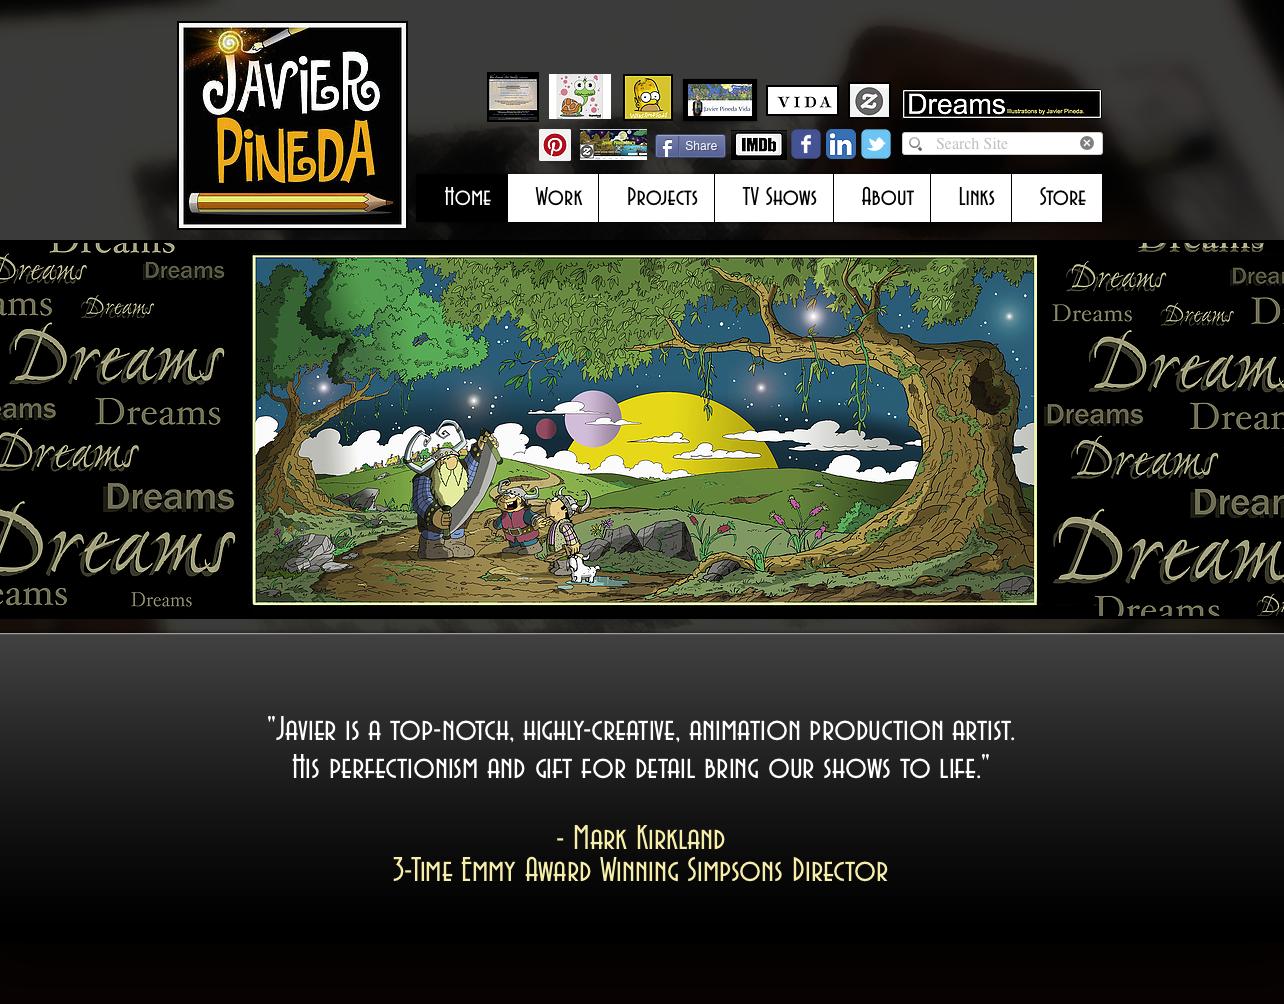 Javier pineda Animation